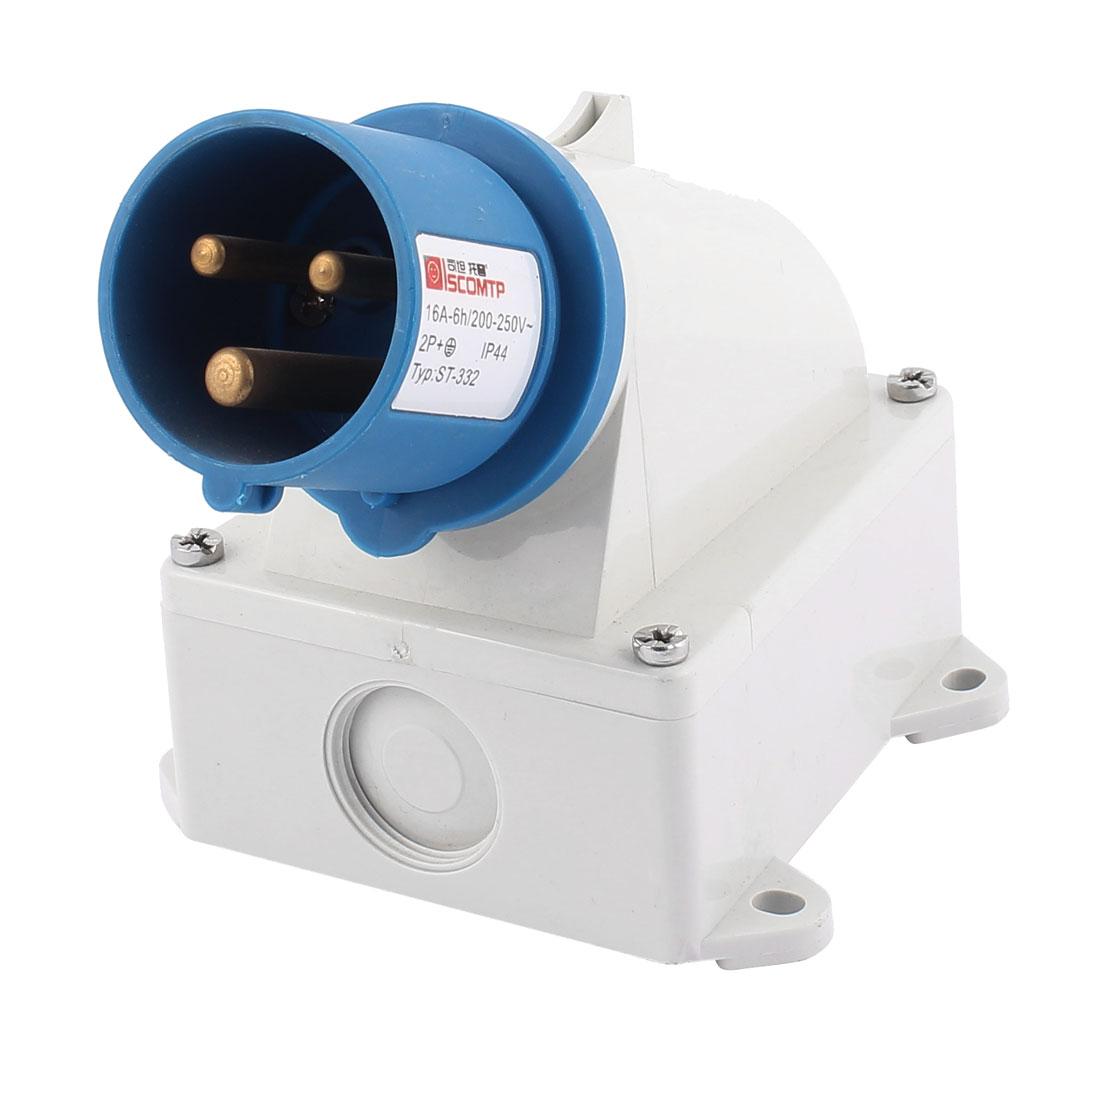 AC 200V-250V 16A IP44 2P+E 3-Terminal Male Industrial Caravan Plug